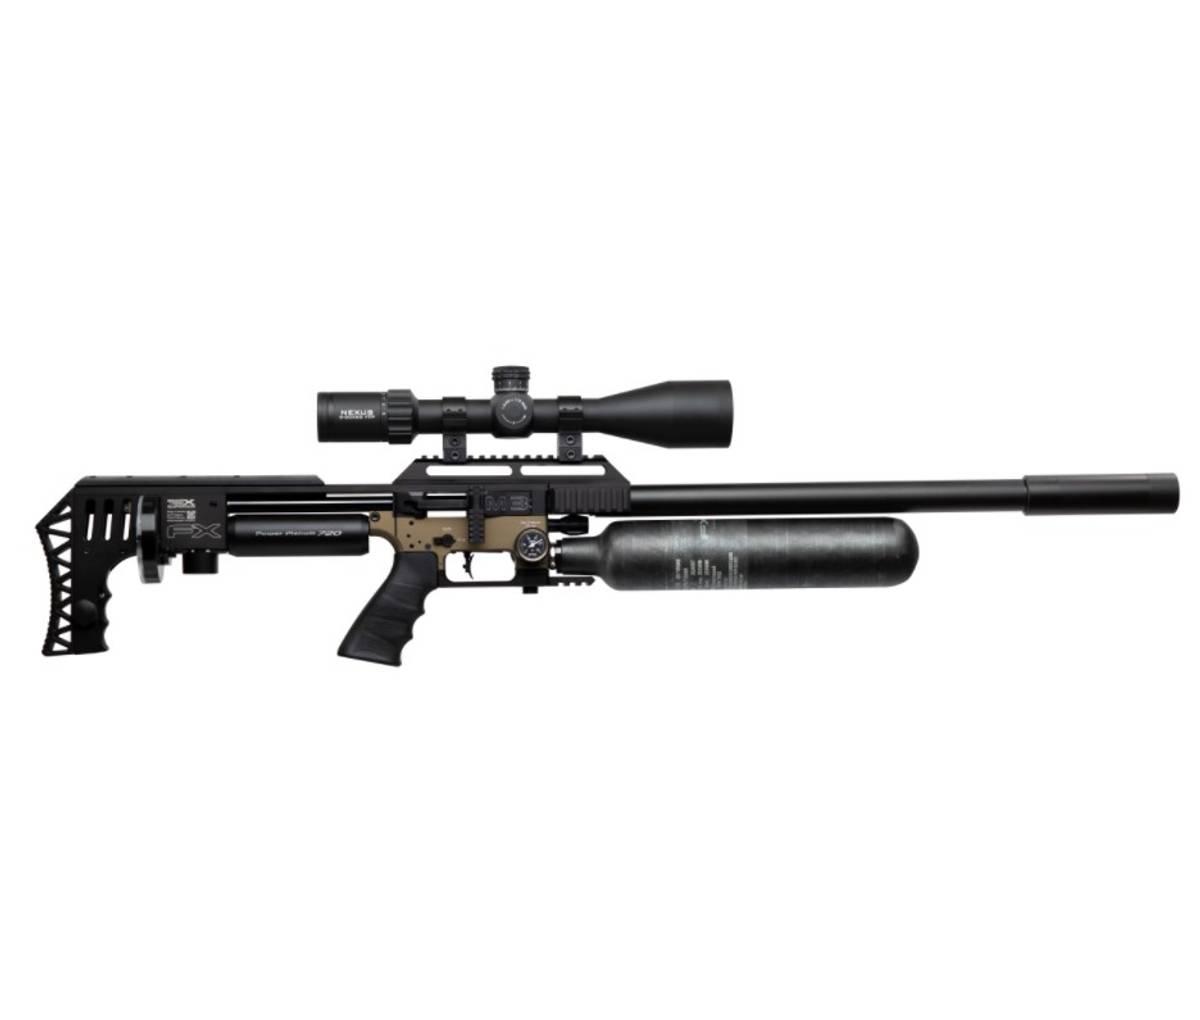 FX Impact M3 Sniper - 5.5mm PCP Luftgevær - Bronze (REGISTRERING